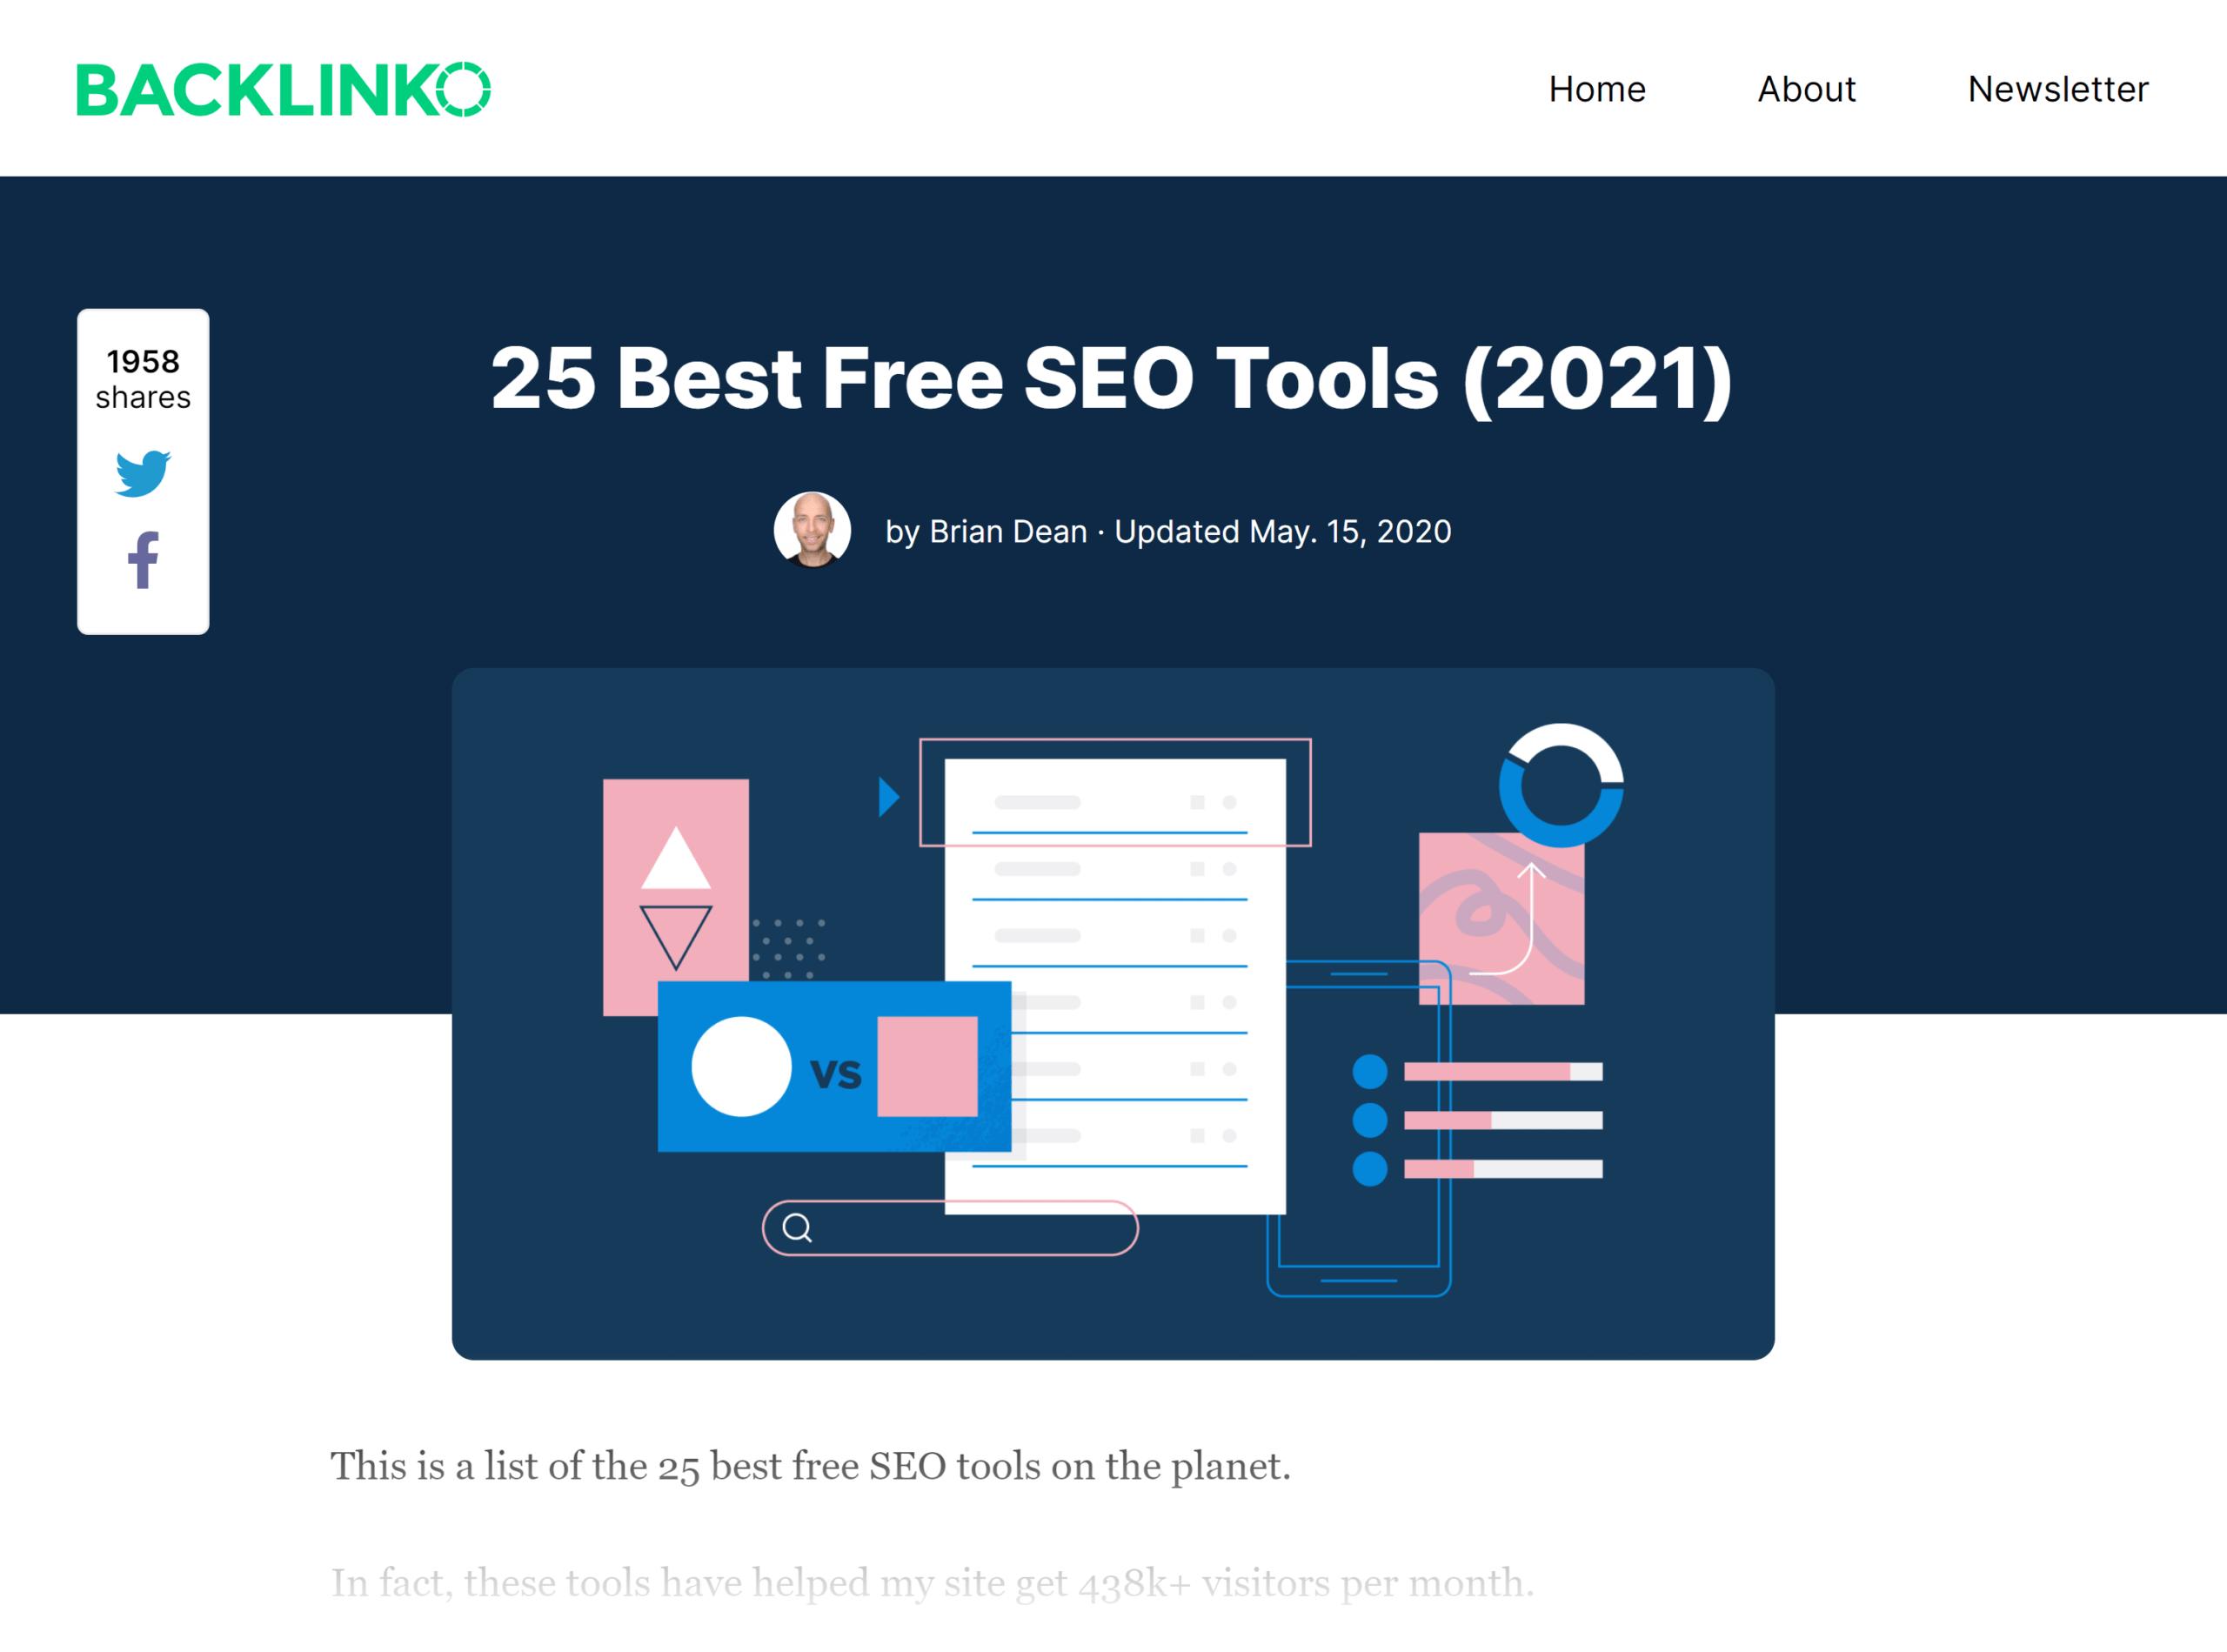 Backlinko – Best free SEO tools